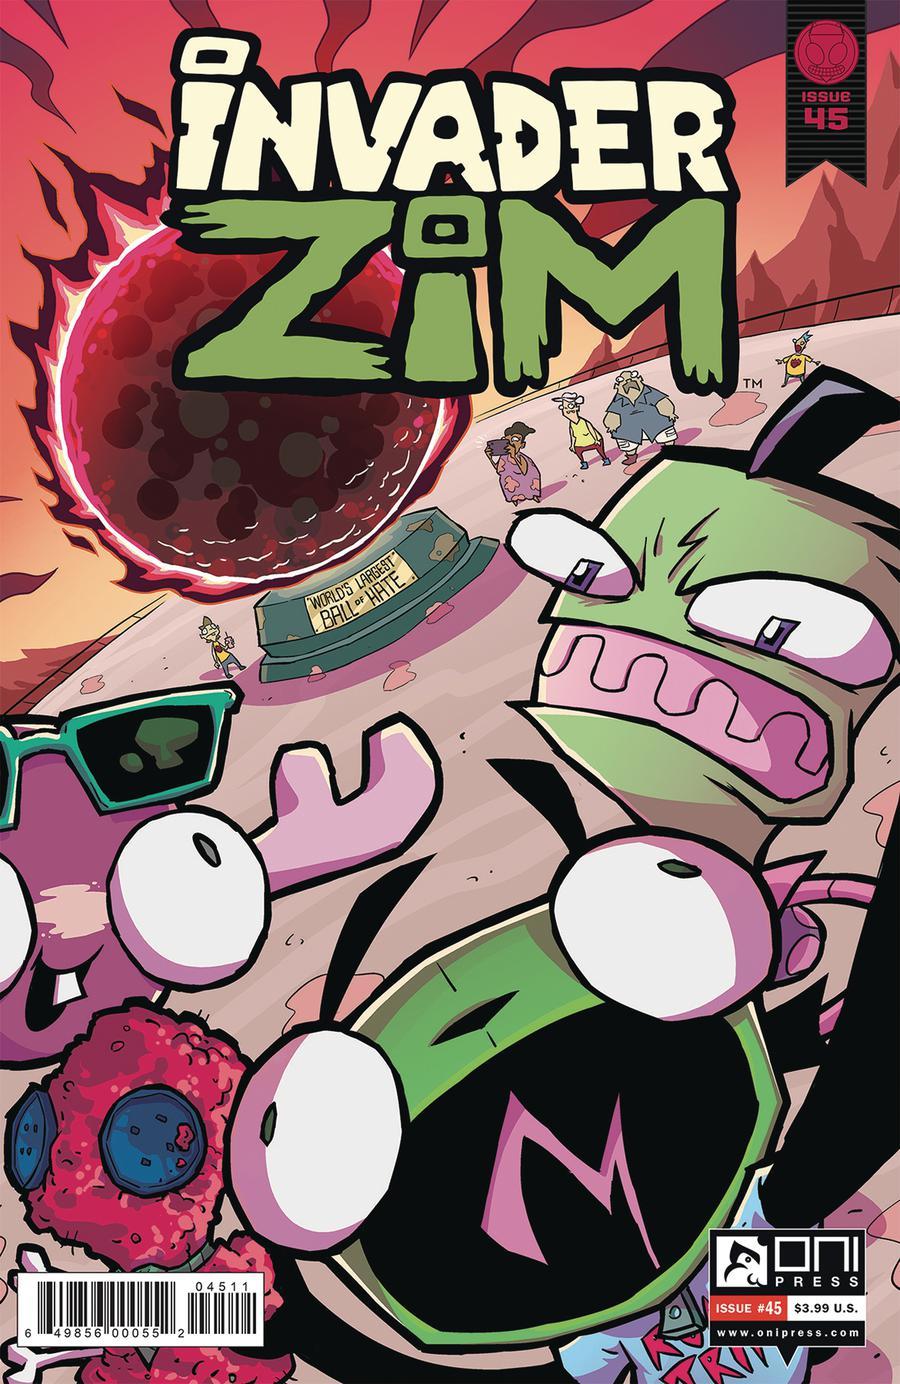 Invader Zim #45 Cover A Regular Warren Wucinich & Fred Stresing Cover